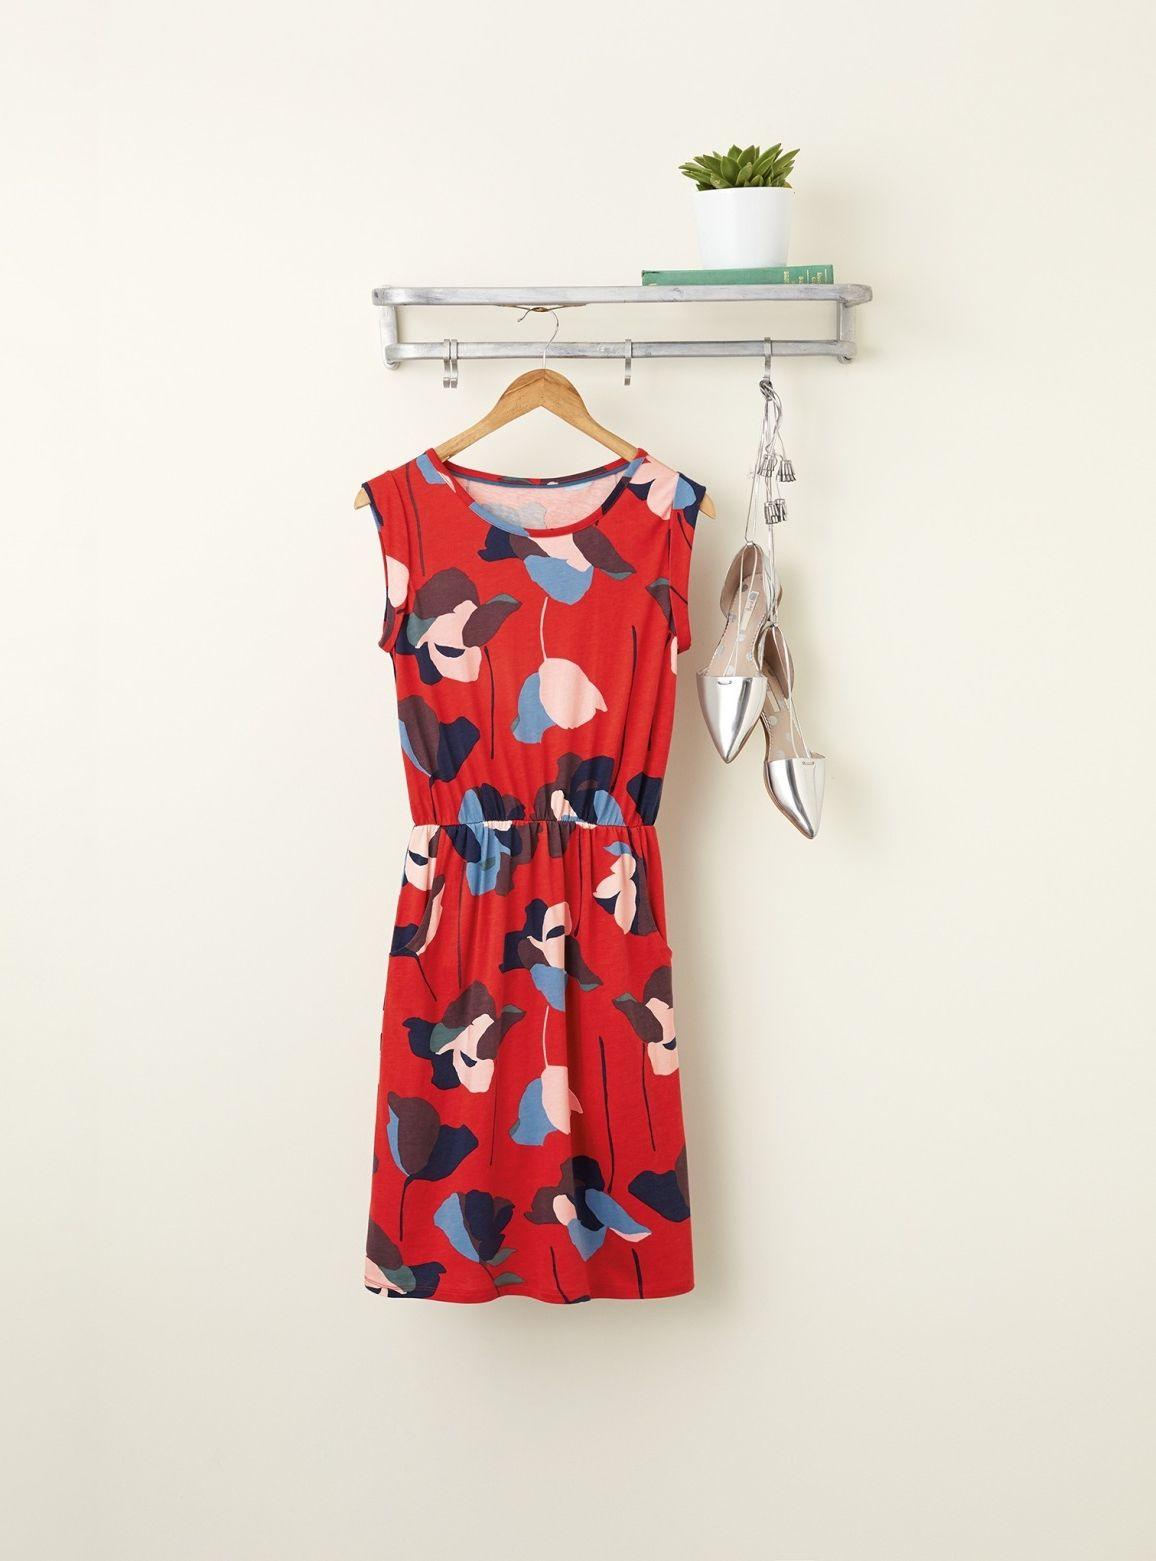 Blackberry Dress Fashion Day Dresses Fabric Print Design [ 1561 x 1156 Pixel ]